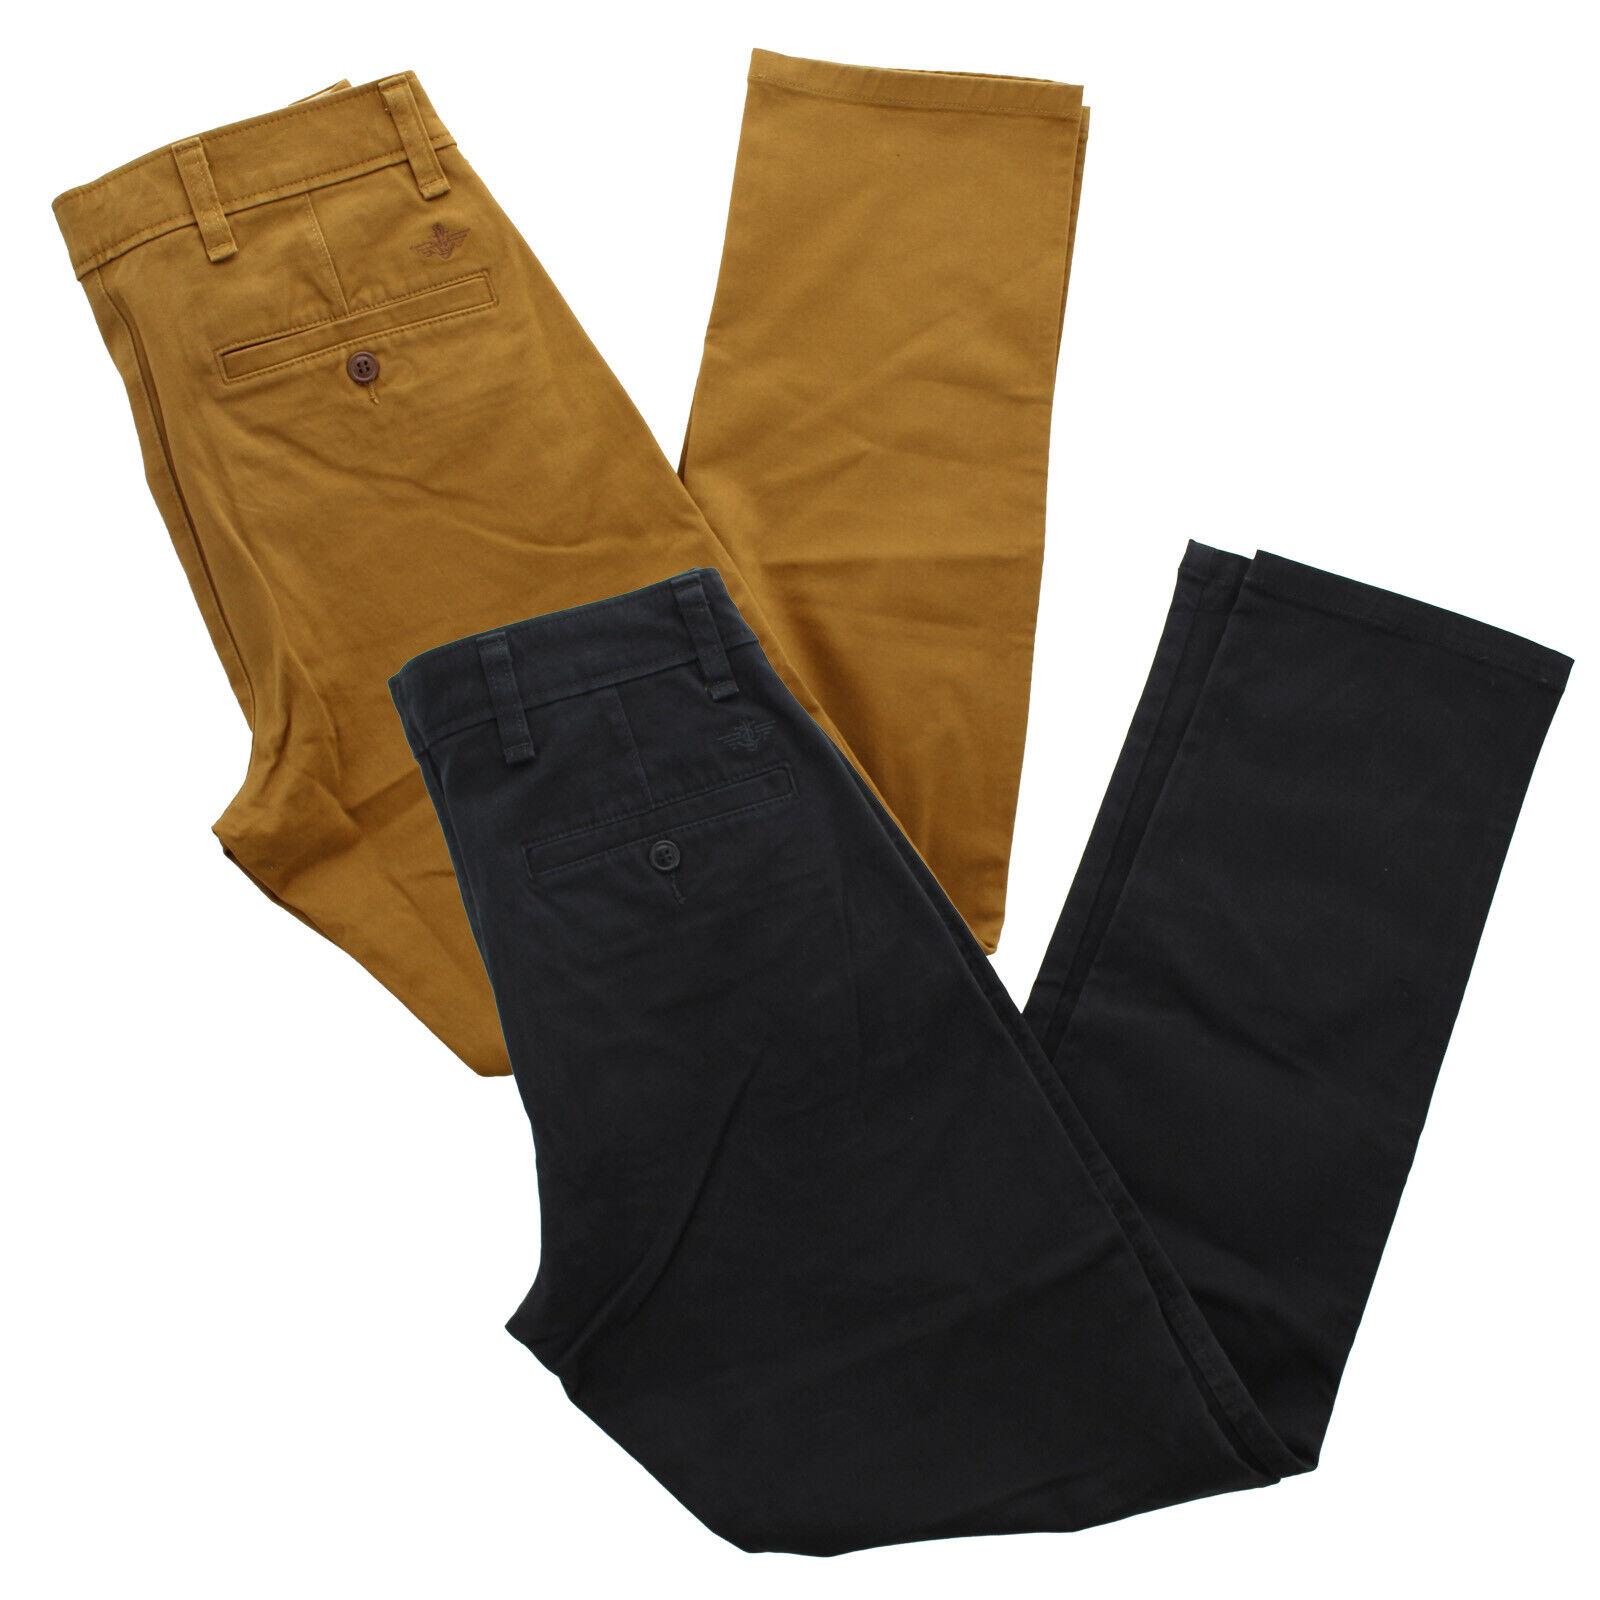 Dockers Men's Ultimate Chino Slim Fit Smart Flex 360 Cotton